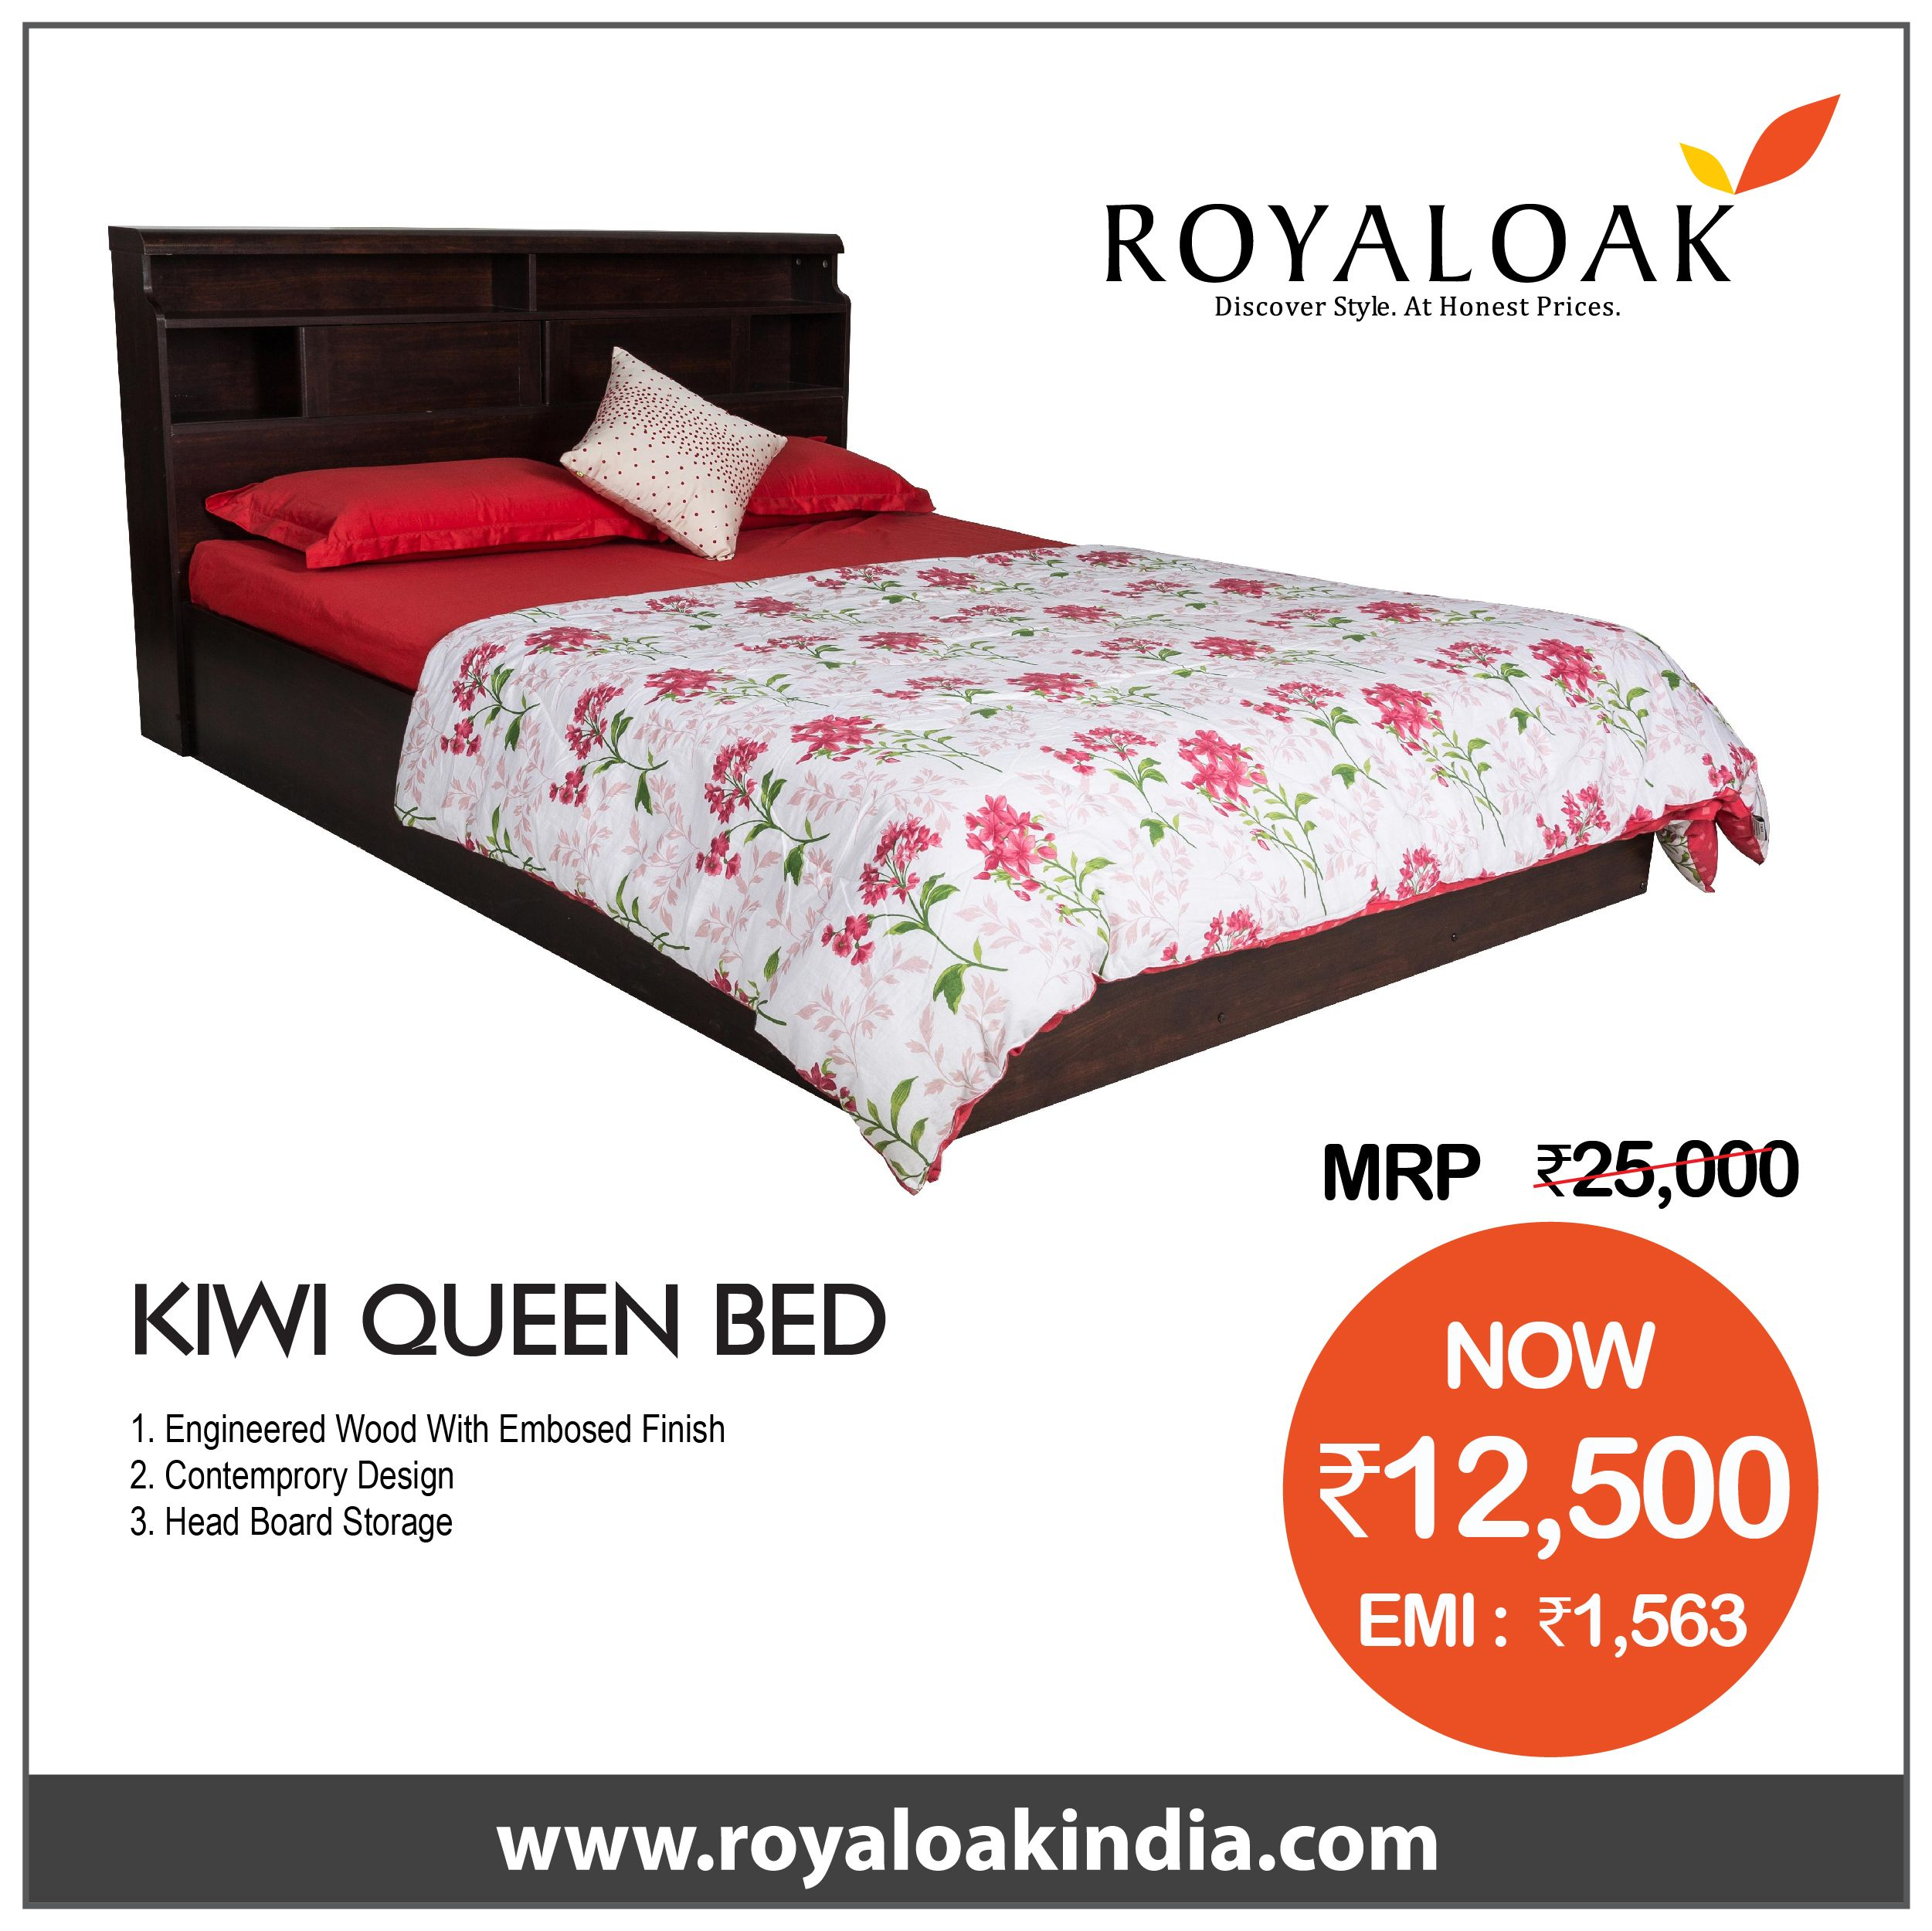 Pin By Royaloak Furniture On Royaloak Queen Bed Dining Table Online Buy Dining Table Queen Beds